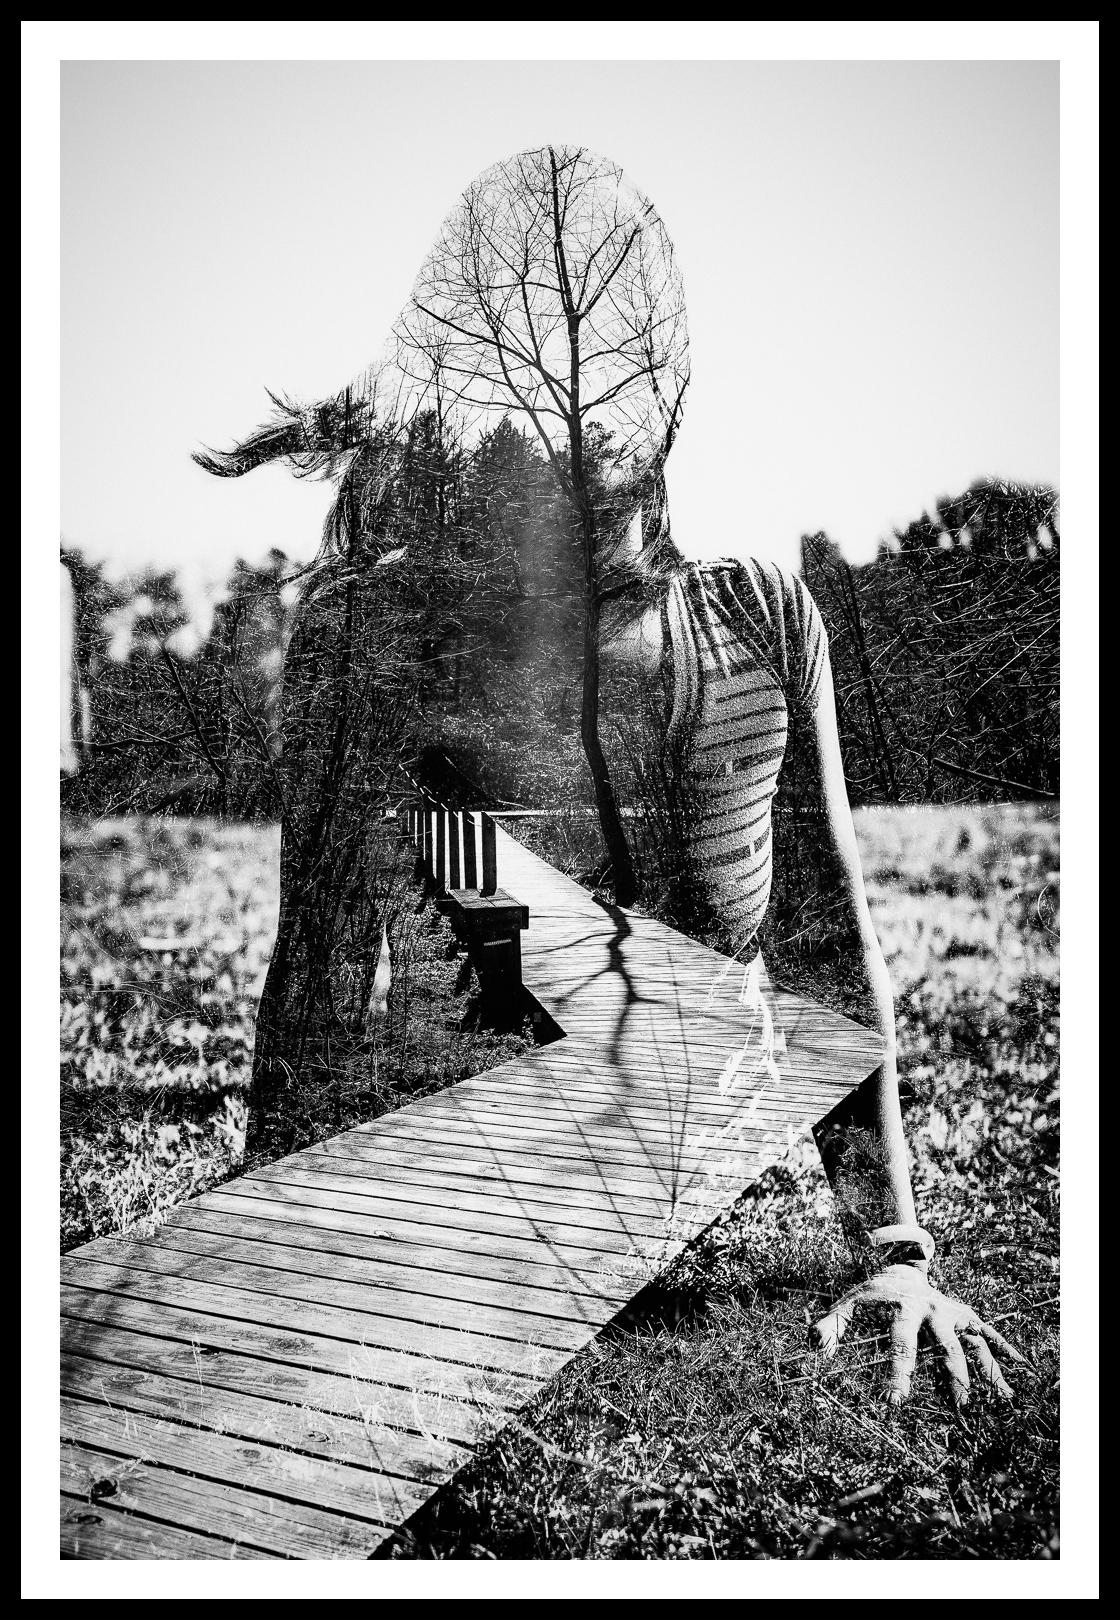 blend-Edit-Edit-2.jpg